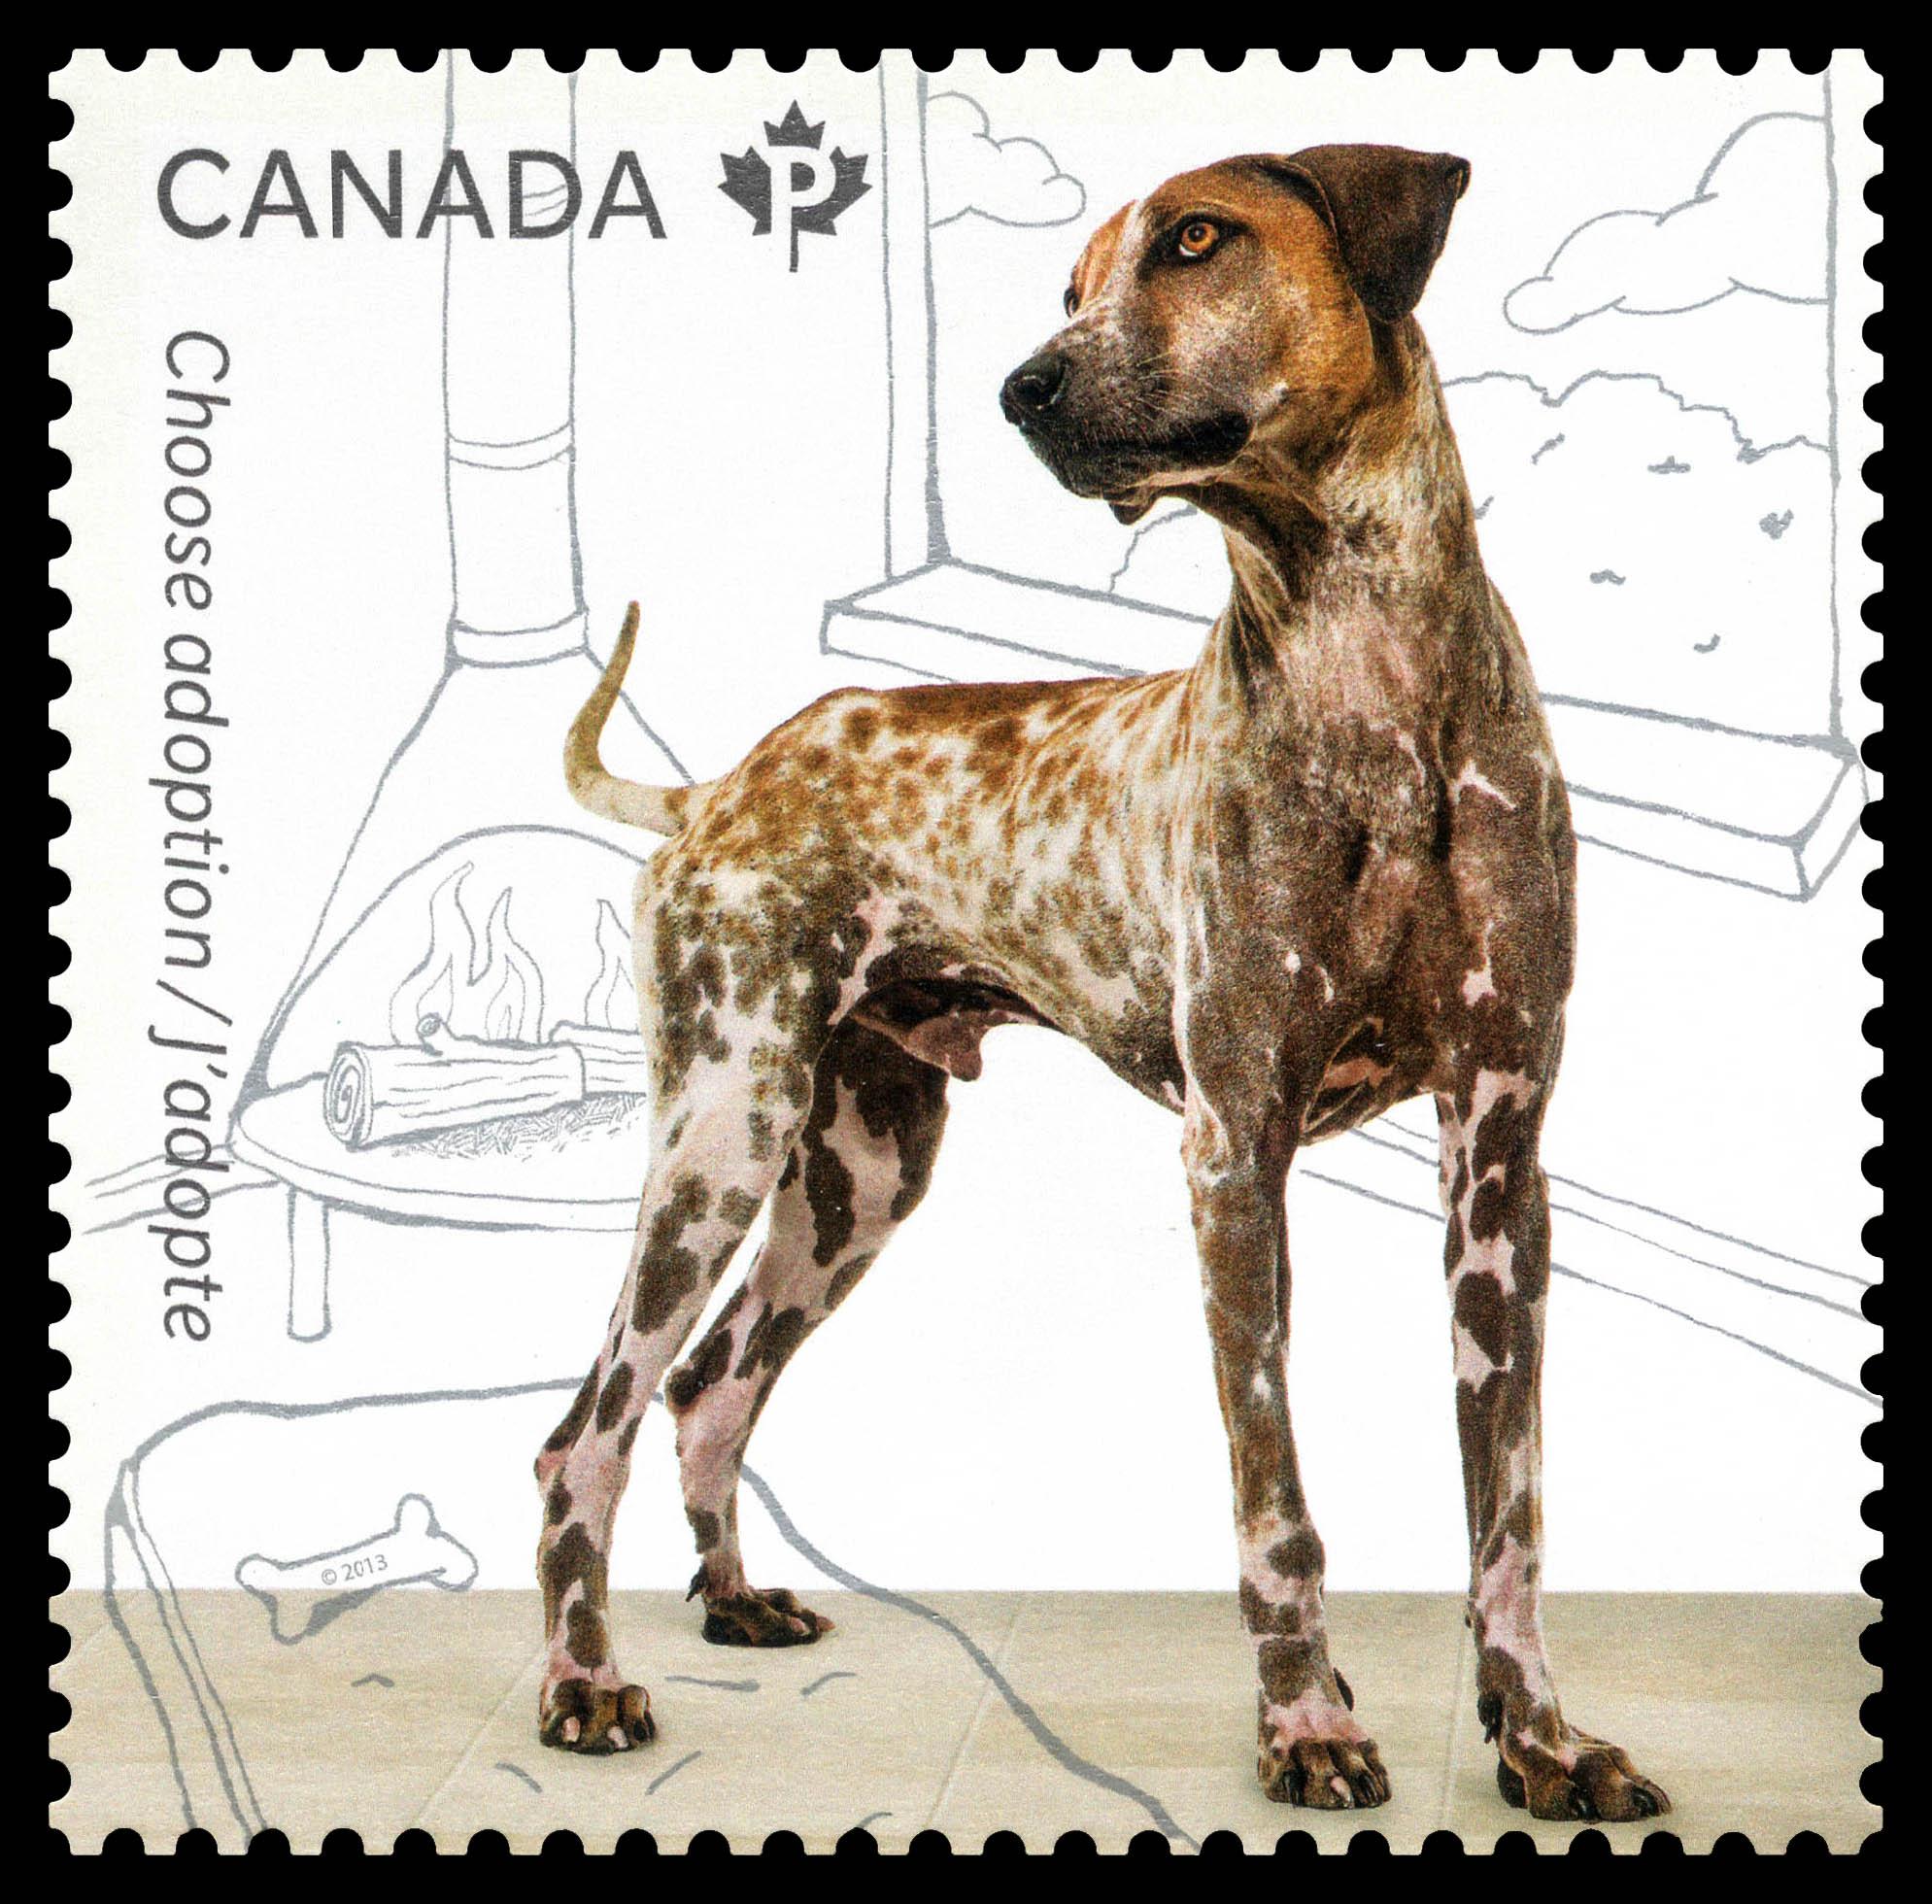 Adopt a Dog Canada Postage Stamp   Adopt a Pet